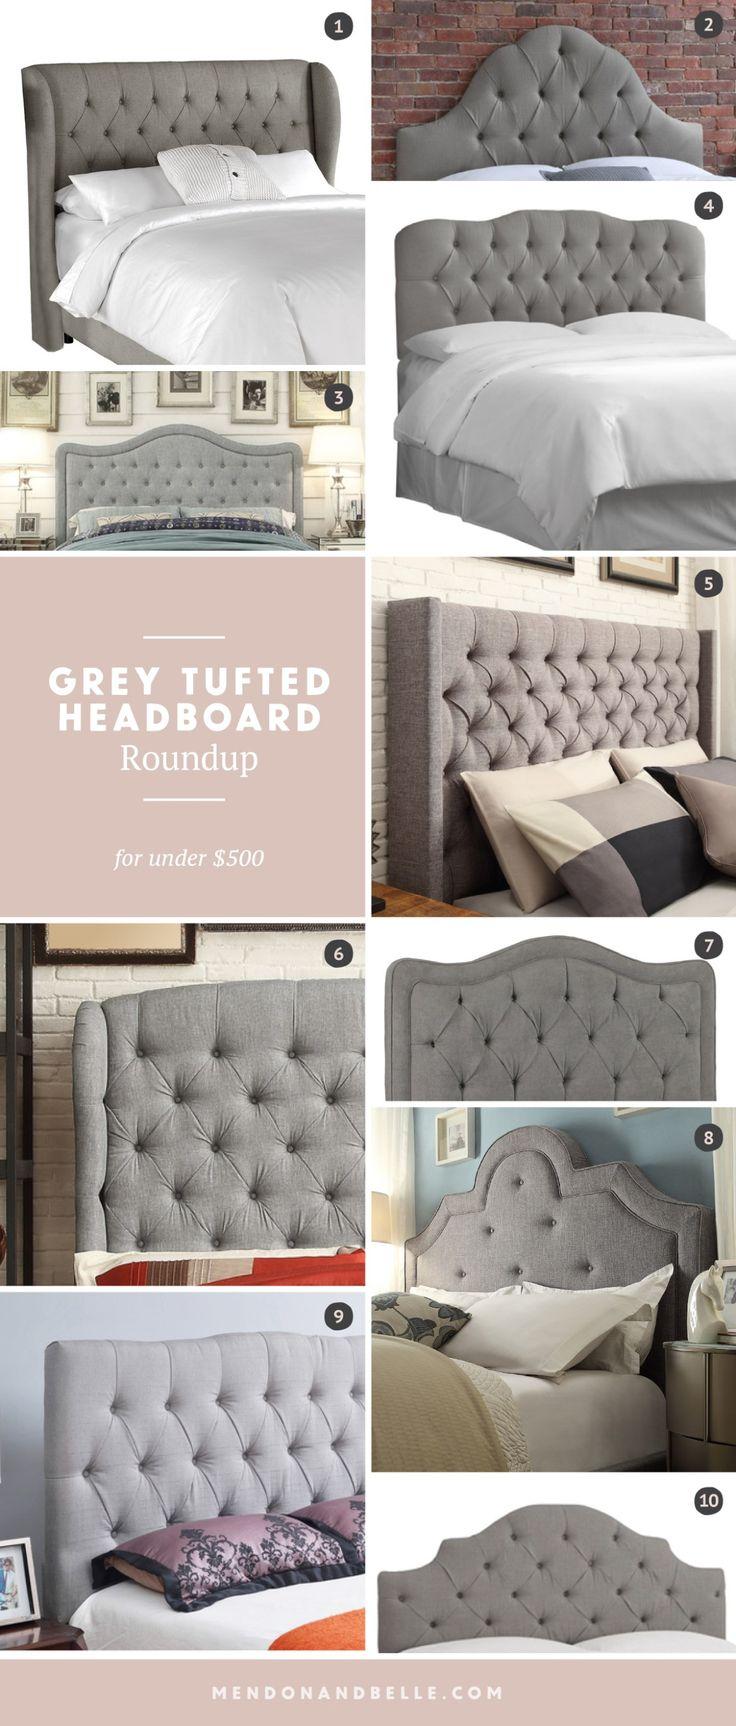 Grey Tufted Headboard Roundup by Robin Budd via www.mendonandbelle.com @robinbudd